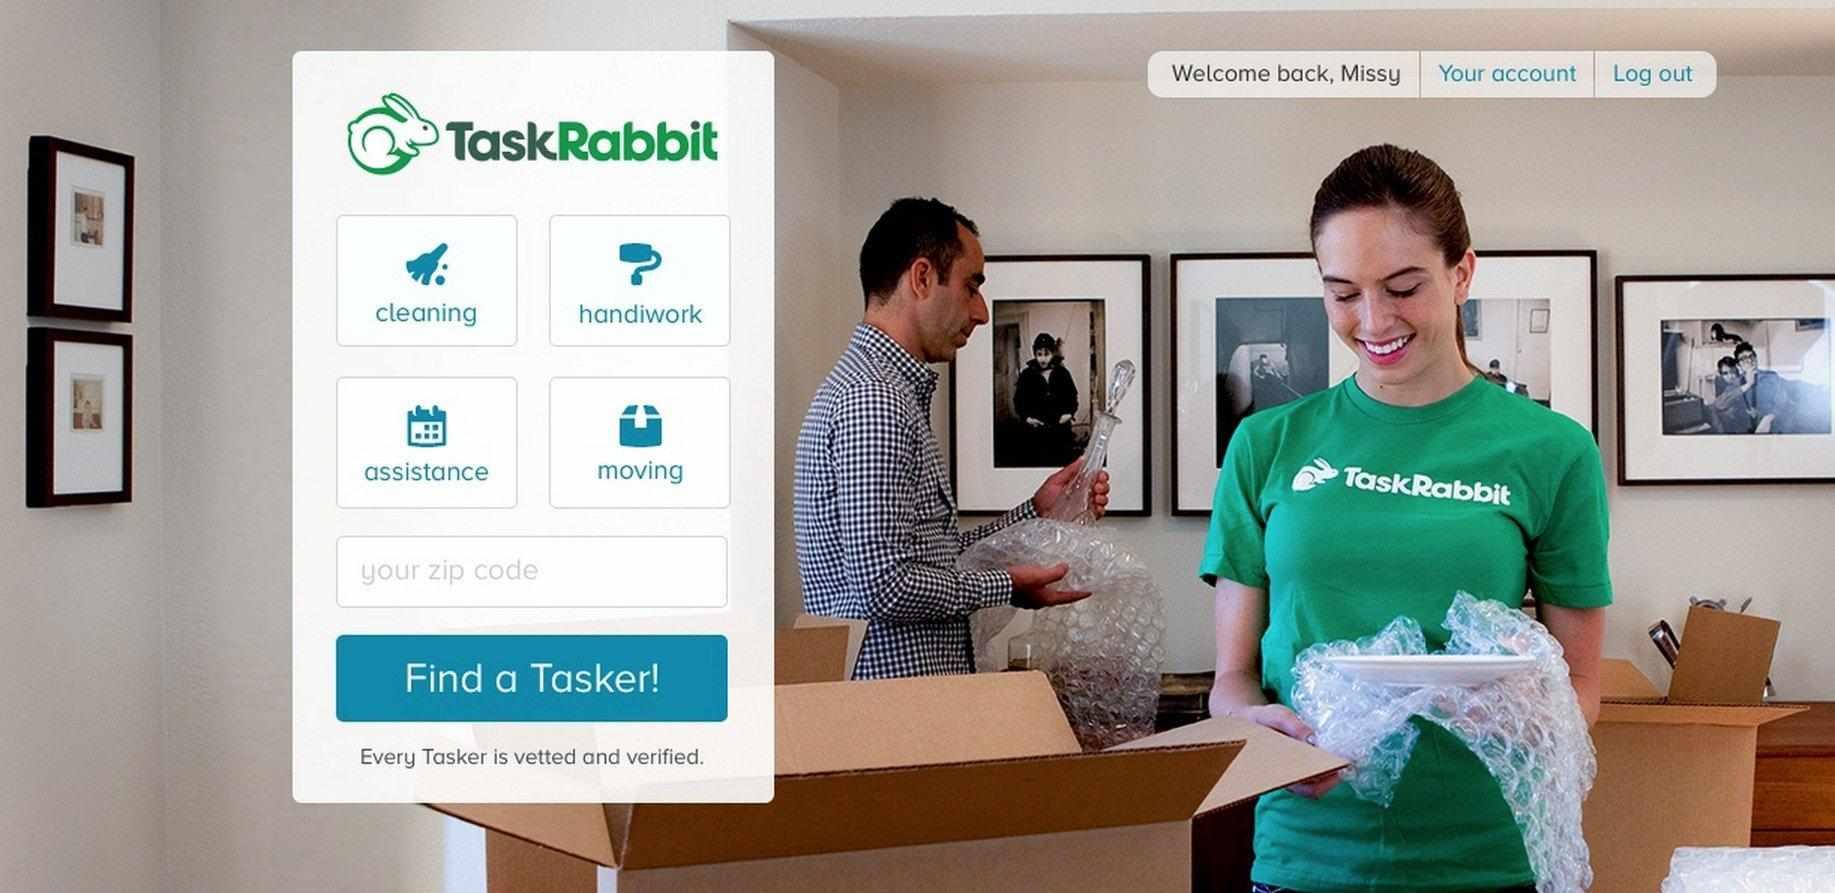 ikea compra taskrabbit